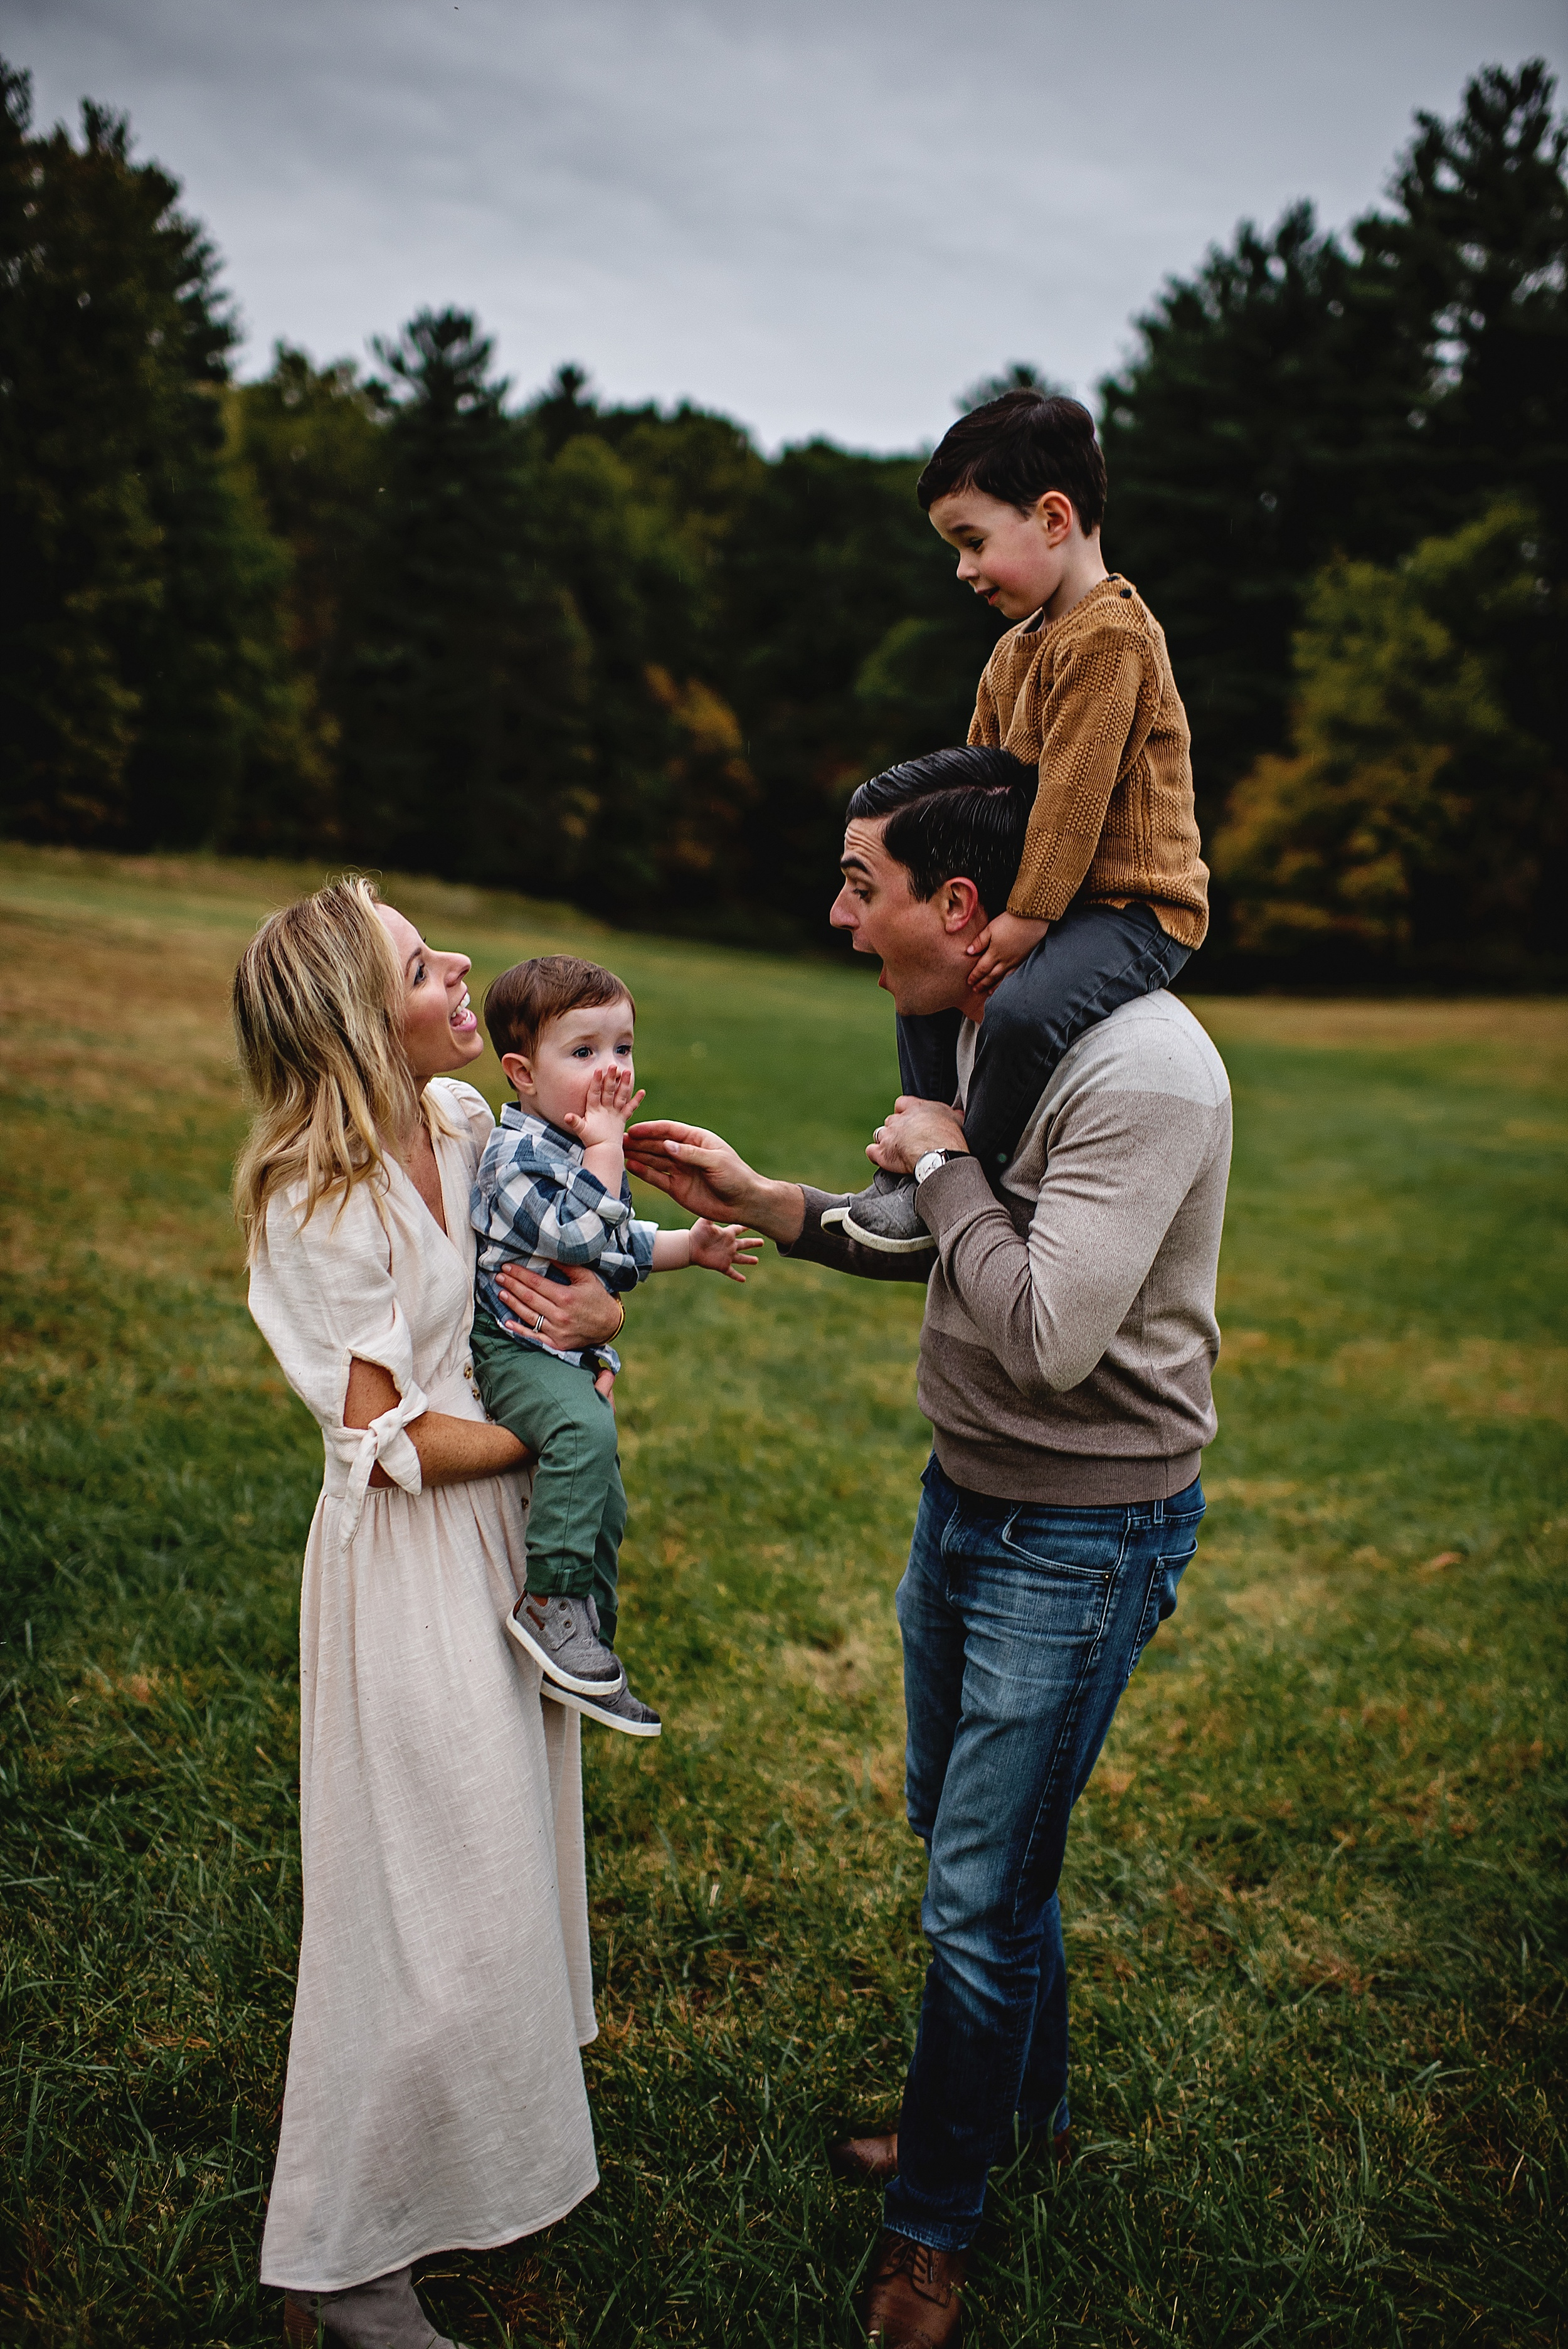 lauren-grayson-photography-portrait-artist-akron-cleveland-ohio-photographer-family-session-fields-sunset-fall_0201.jpg